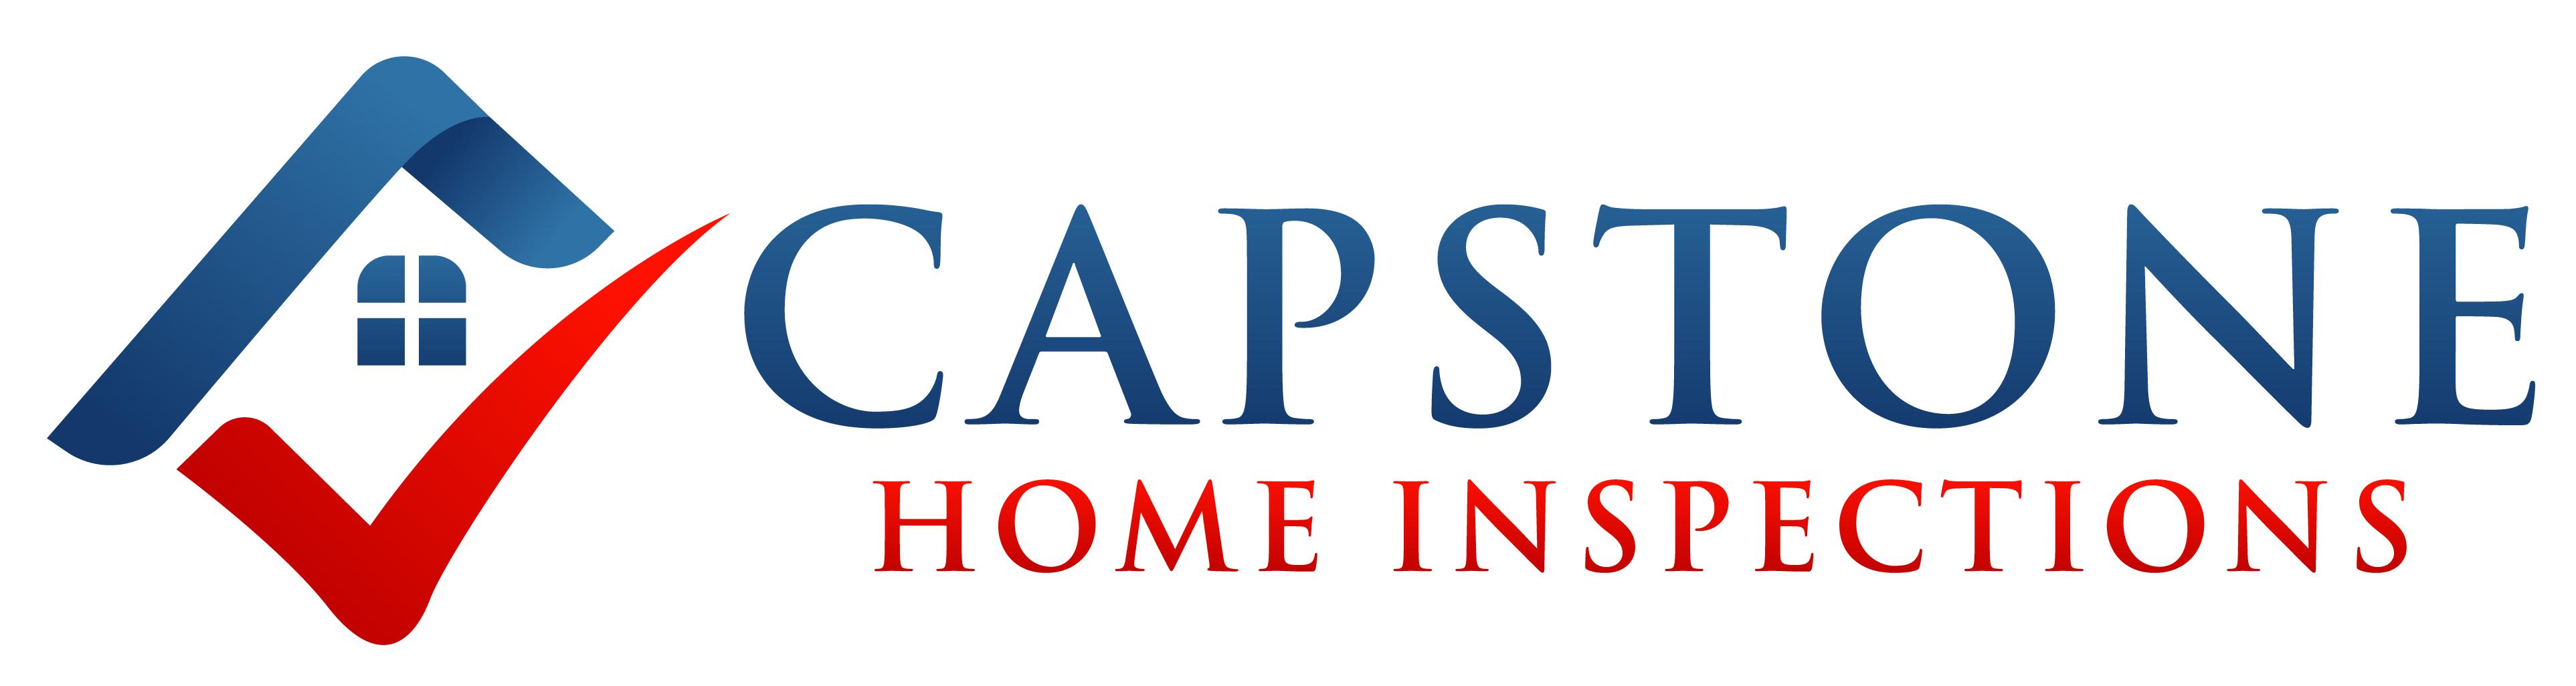 Capstone home inspections logo 2